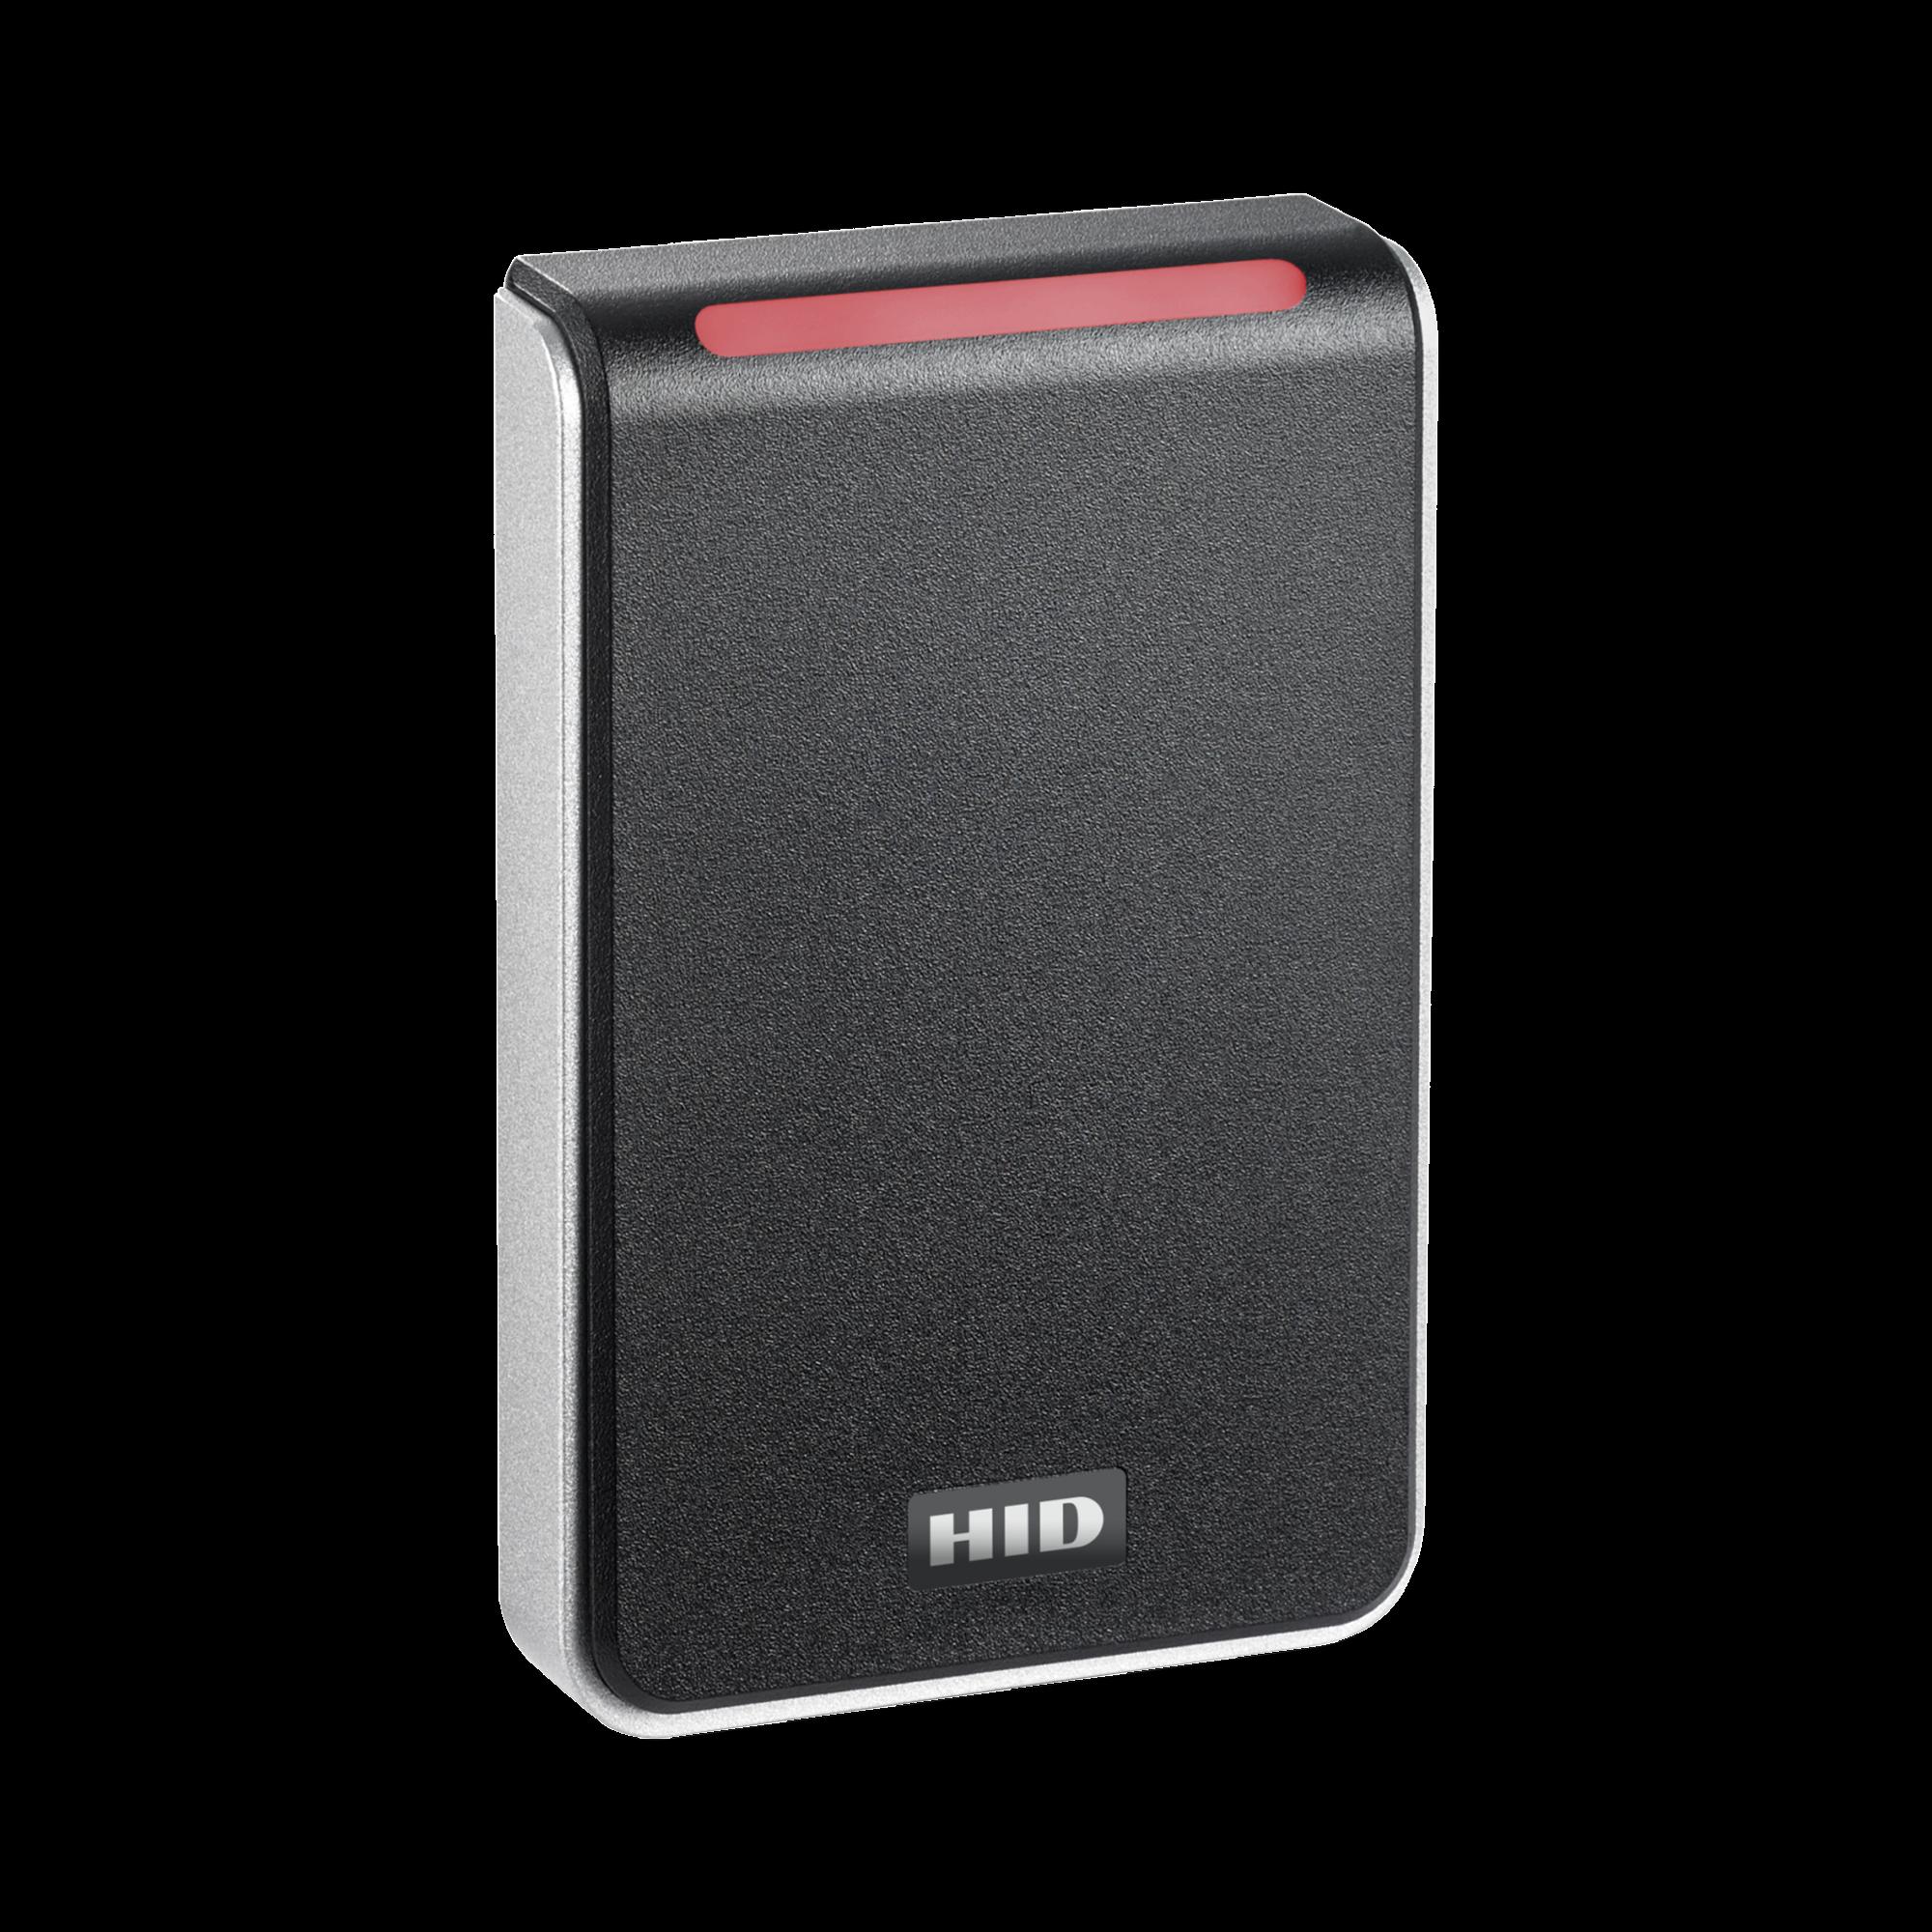 Lector SIGNO Multitecnologia/ 40NKS-01-000000/ Garantia de Por Vida/ Pigtail/Wiegand & OSDP